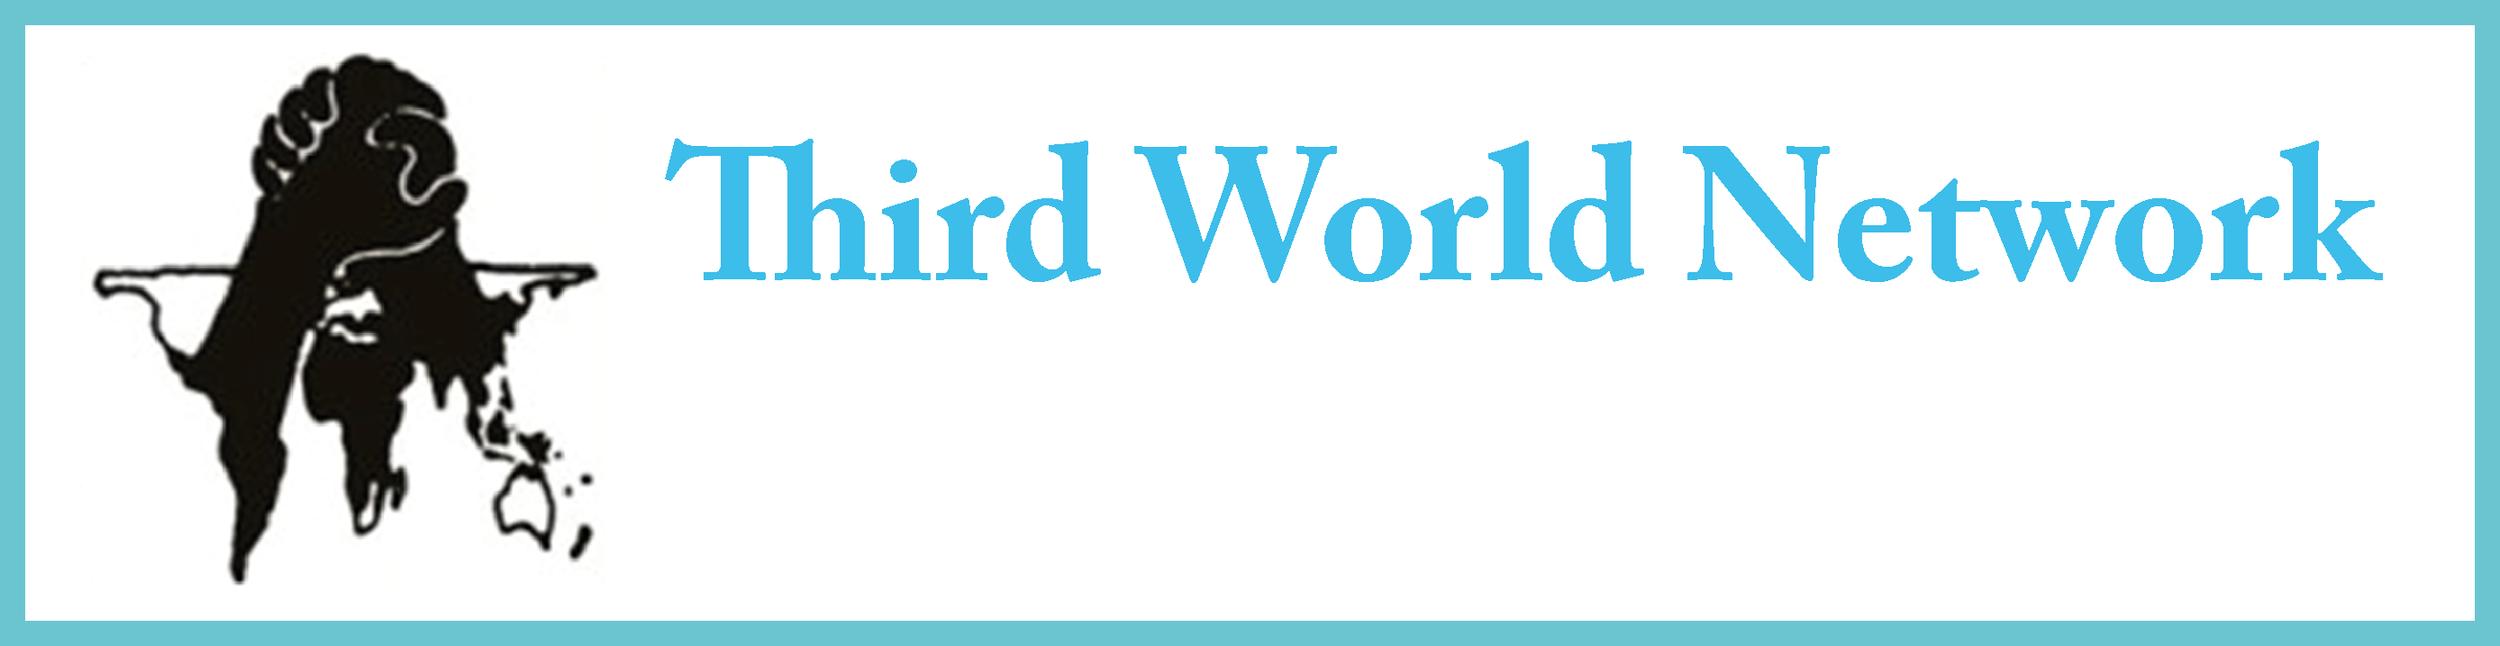 Third World Network.png